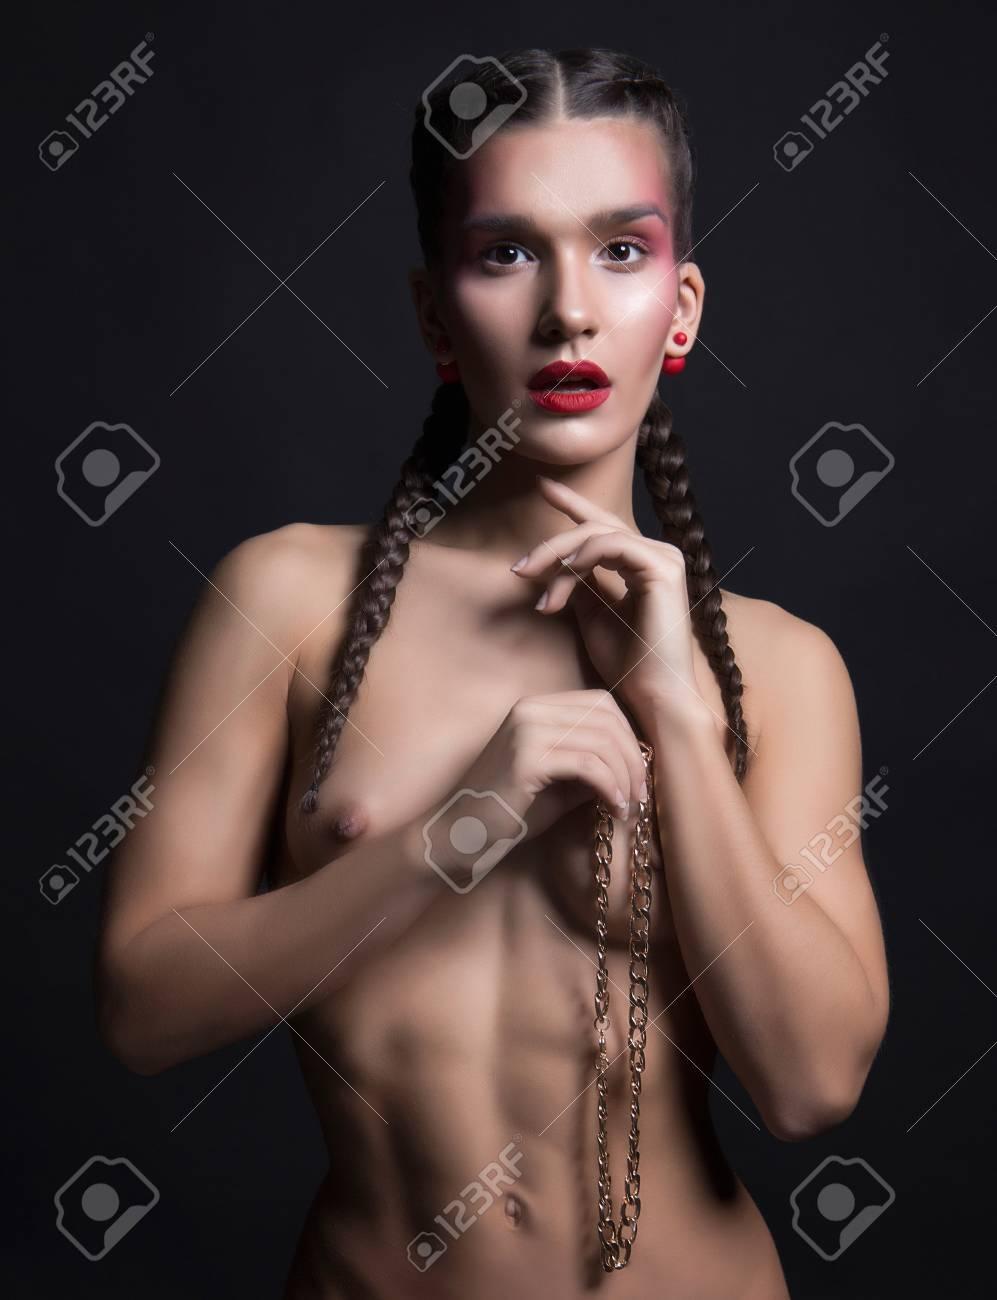 Anal beads naked girls